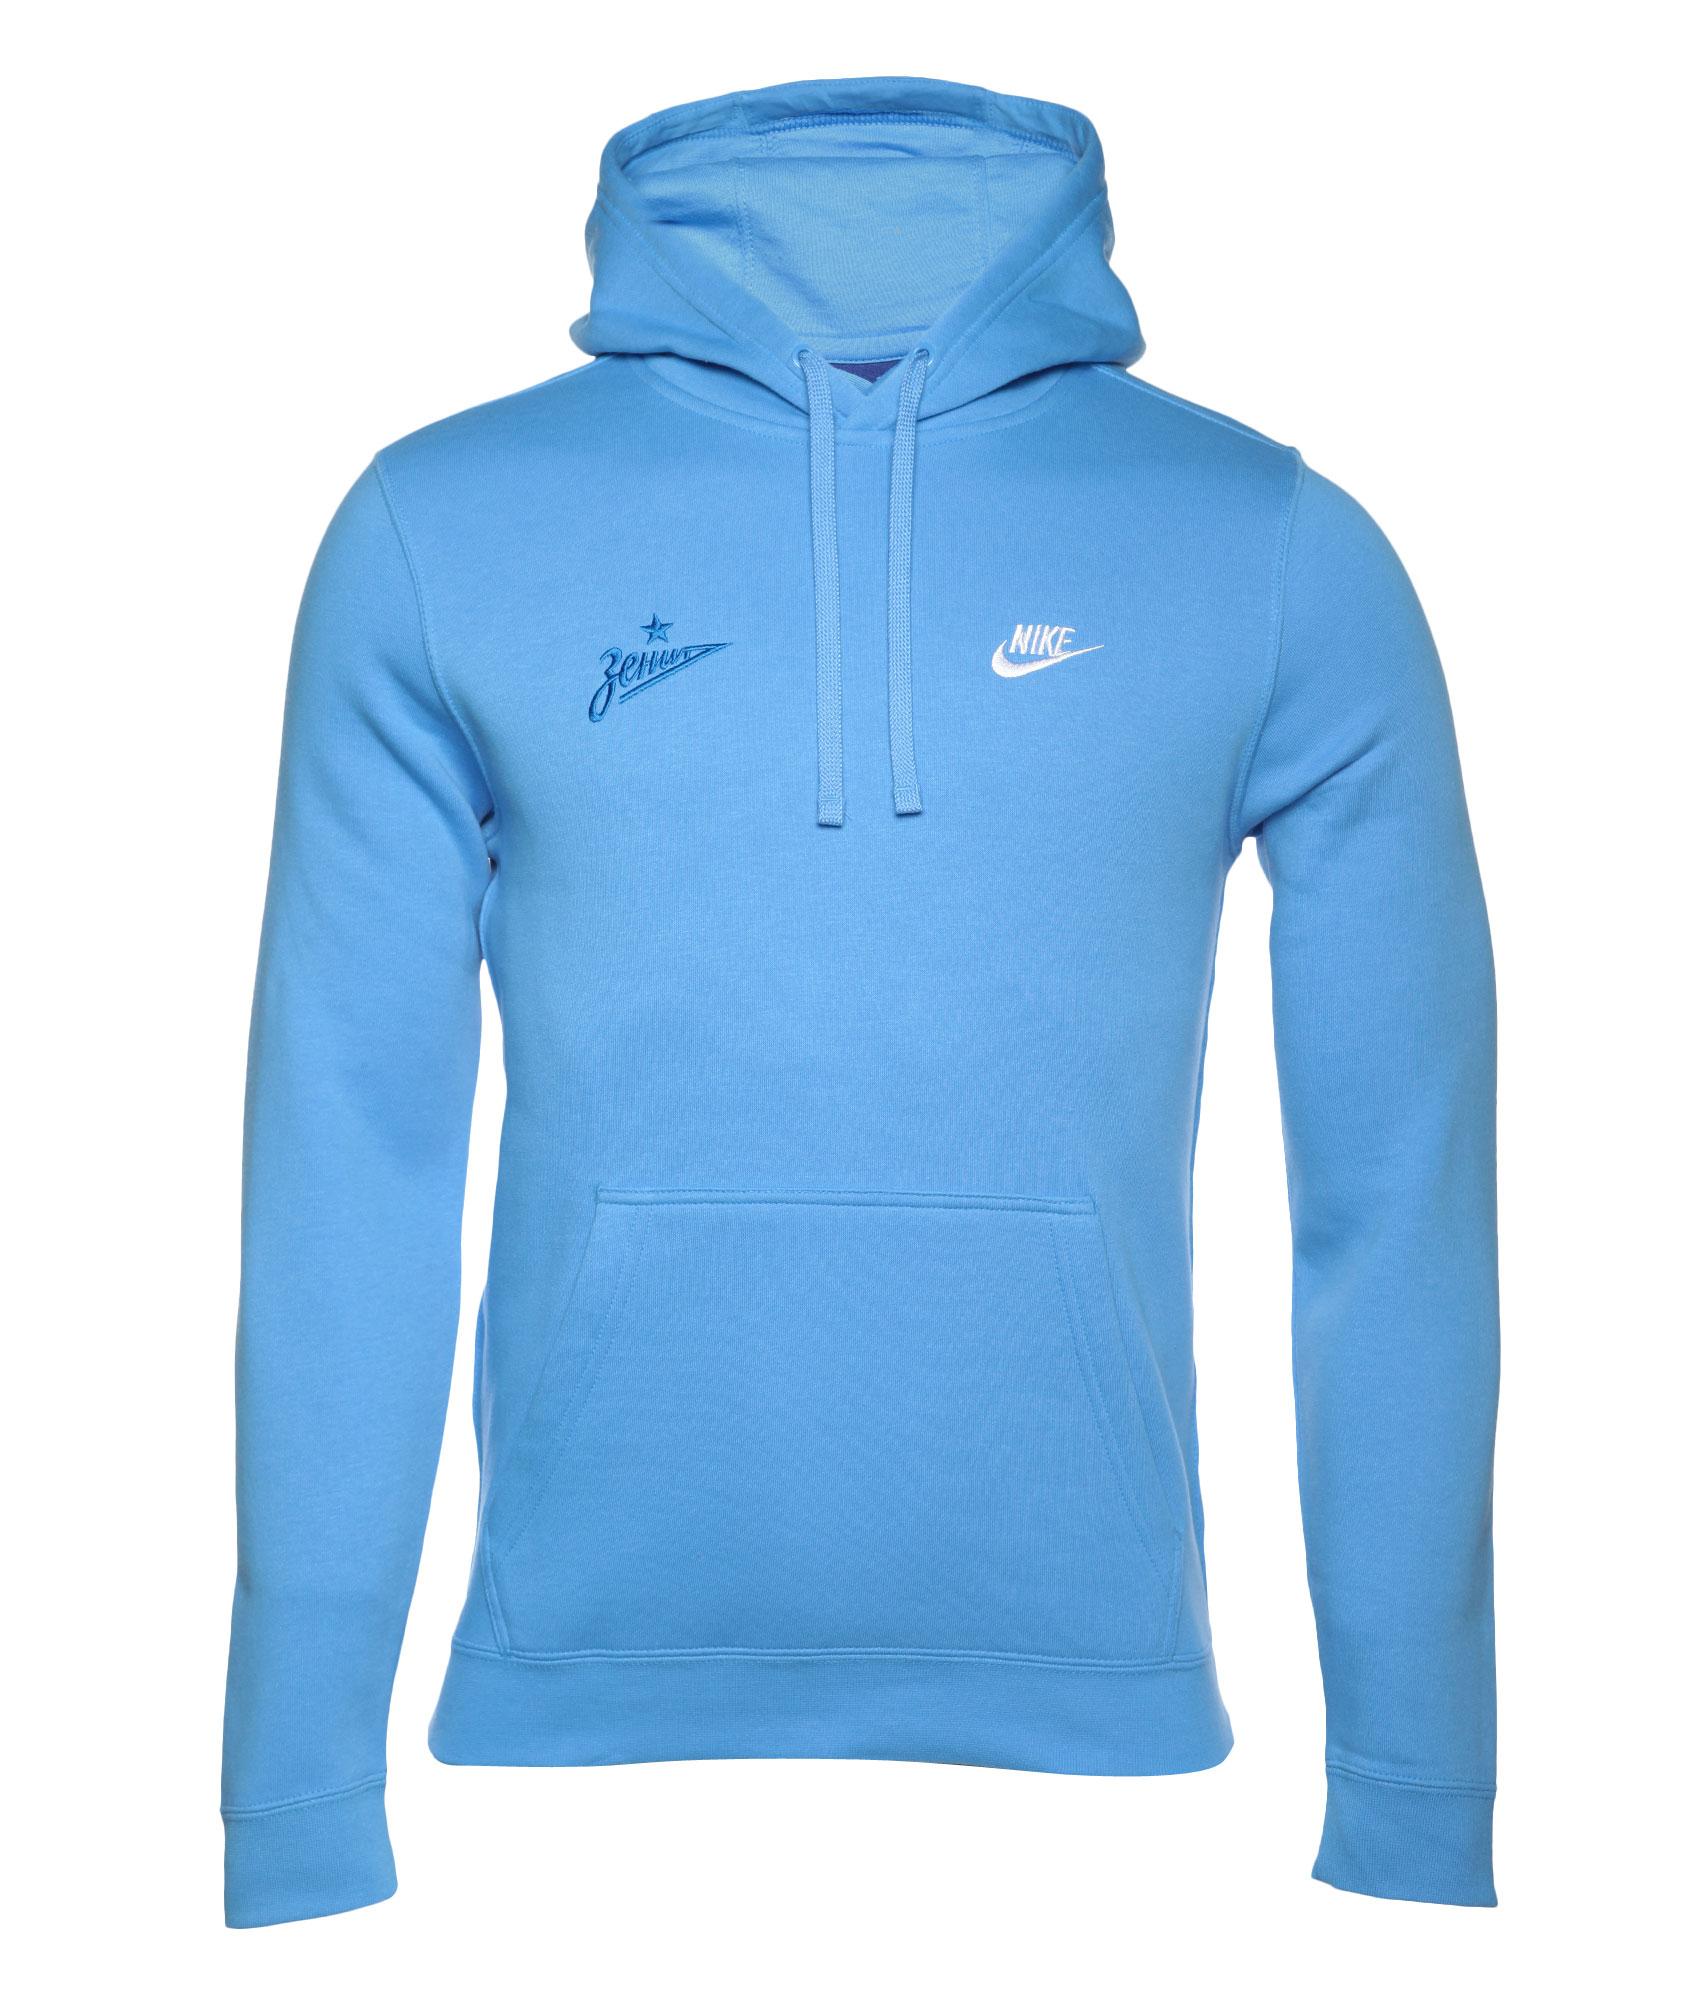 Толстовка Nike, Цвет-Голубой, Размер-M поло nike цвет голубой размер m